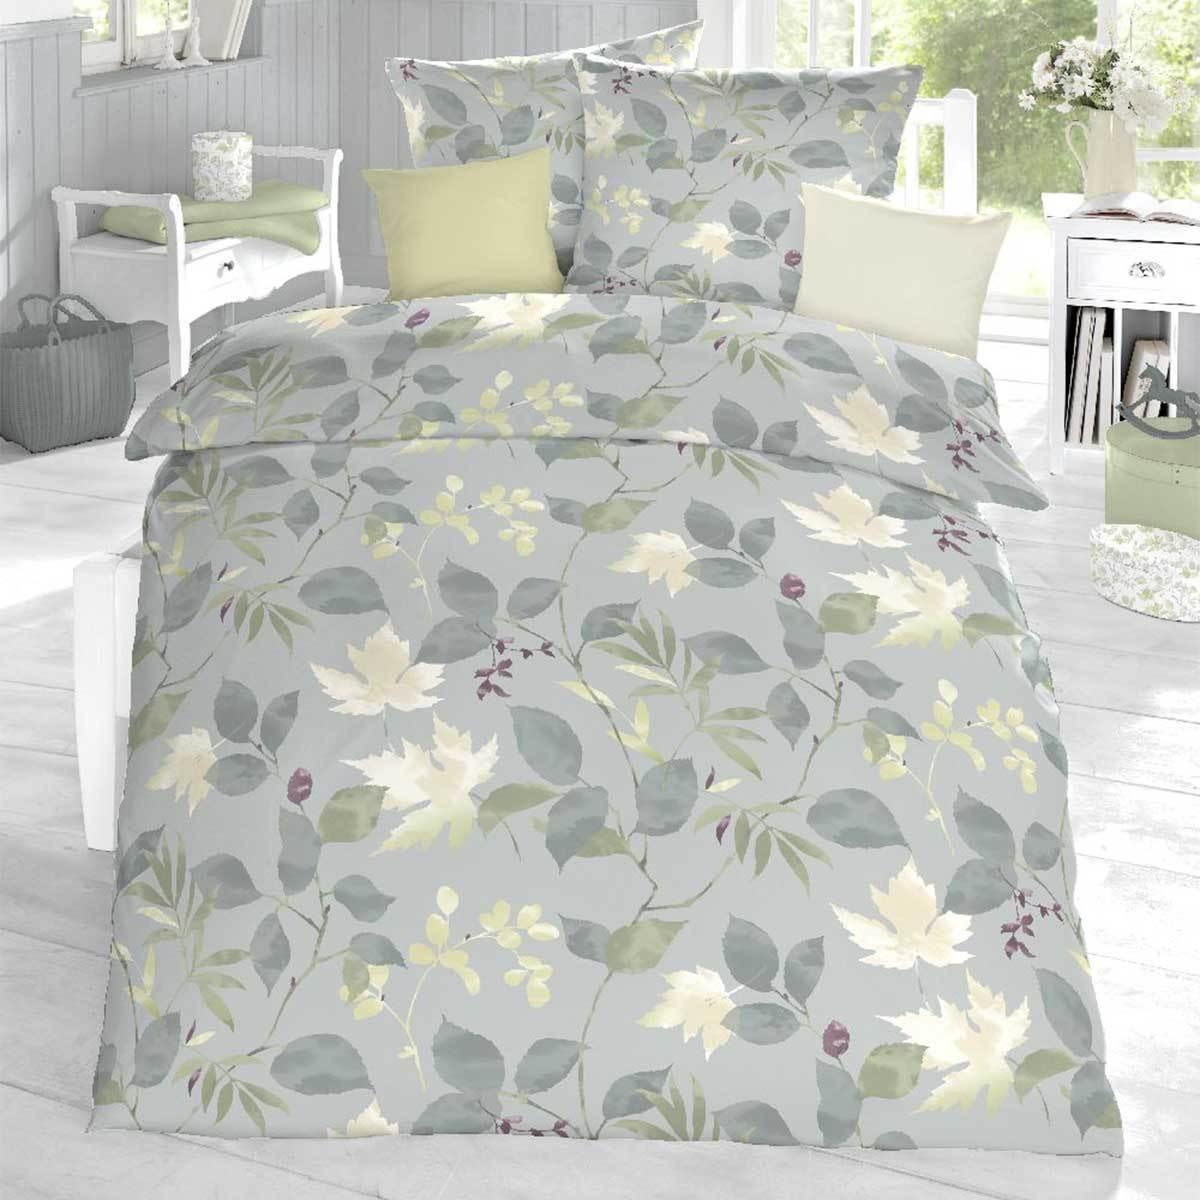 schlafgut soft touch cotton bettw sche cynthia steingr n. Black Bedroom Furniture Sets. Home Design Ideas